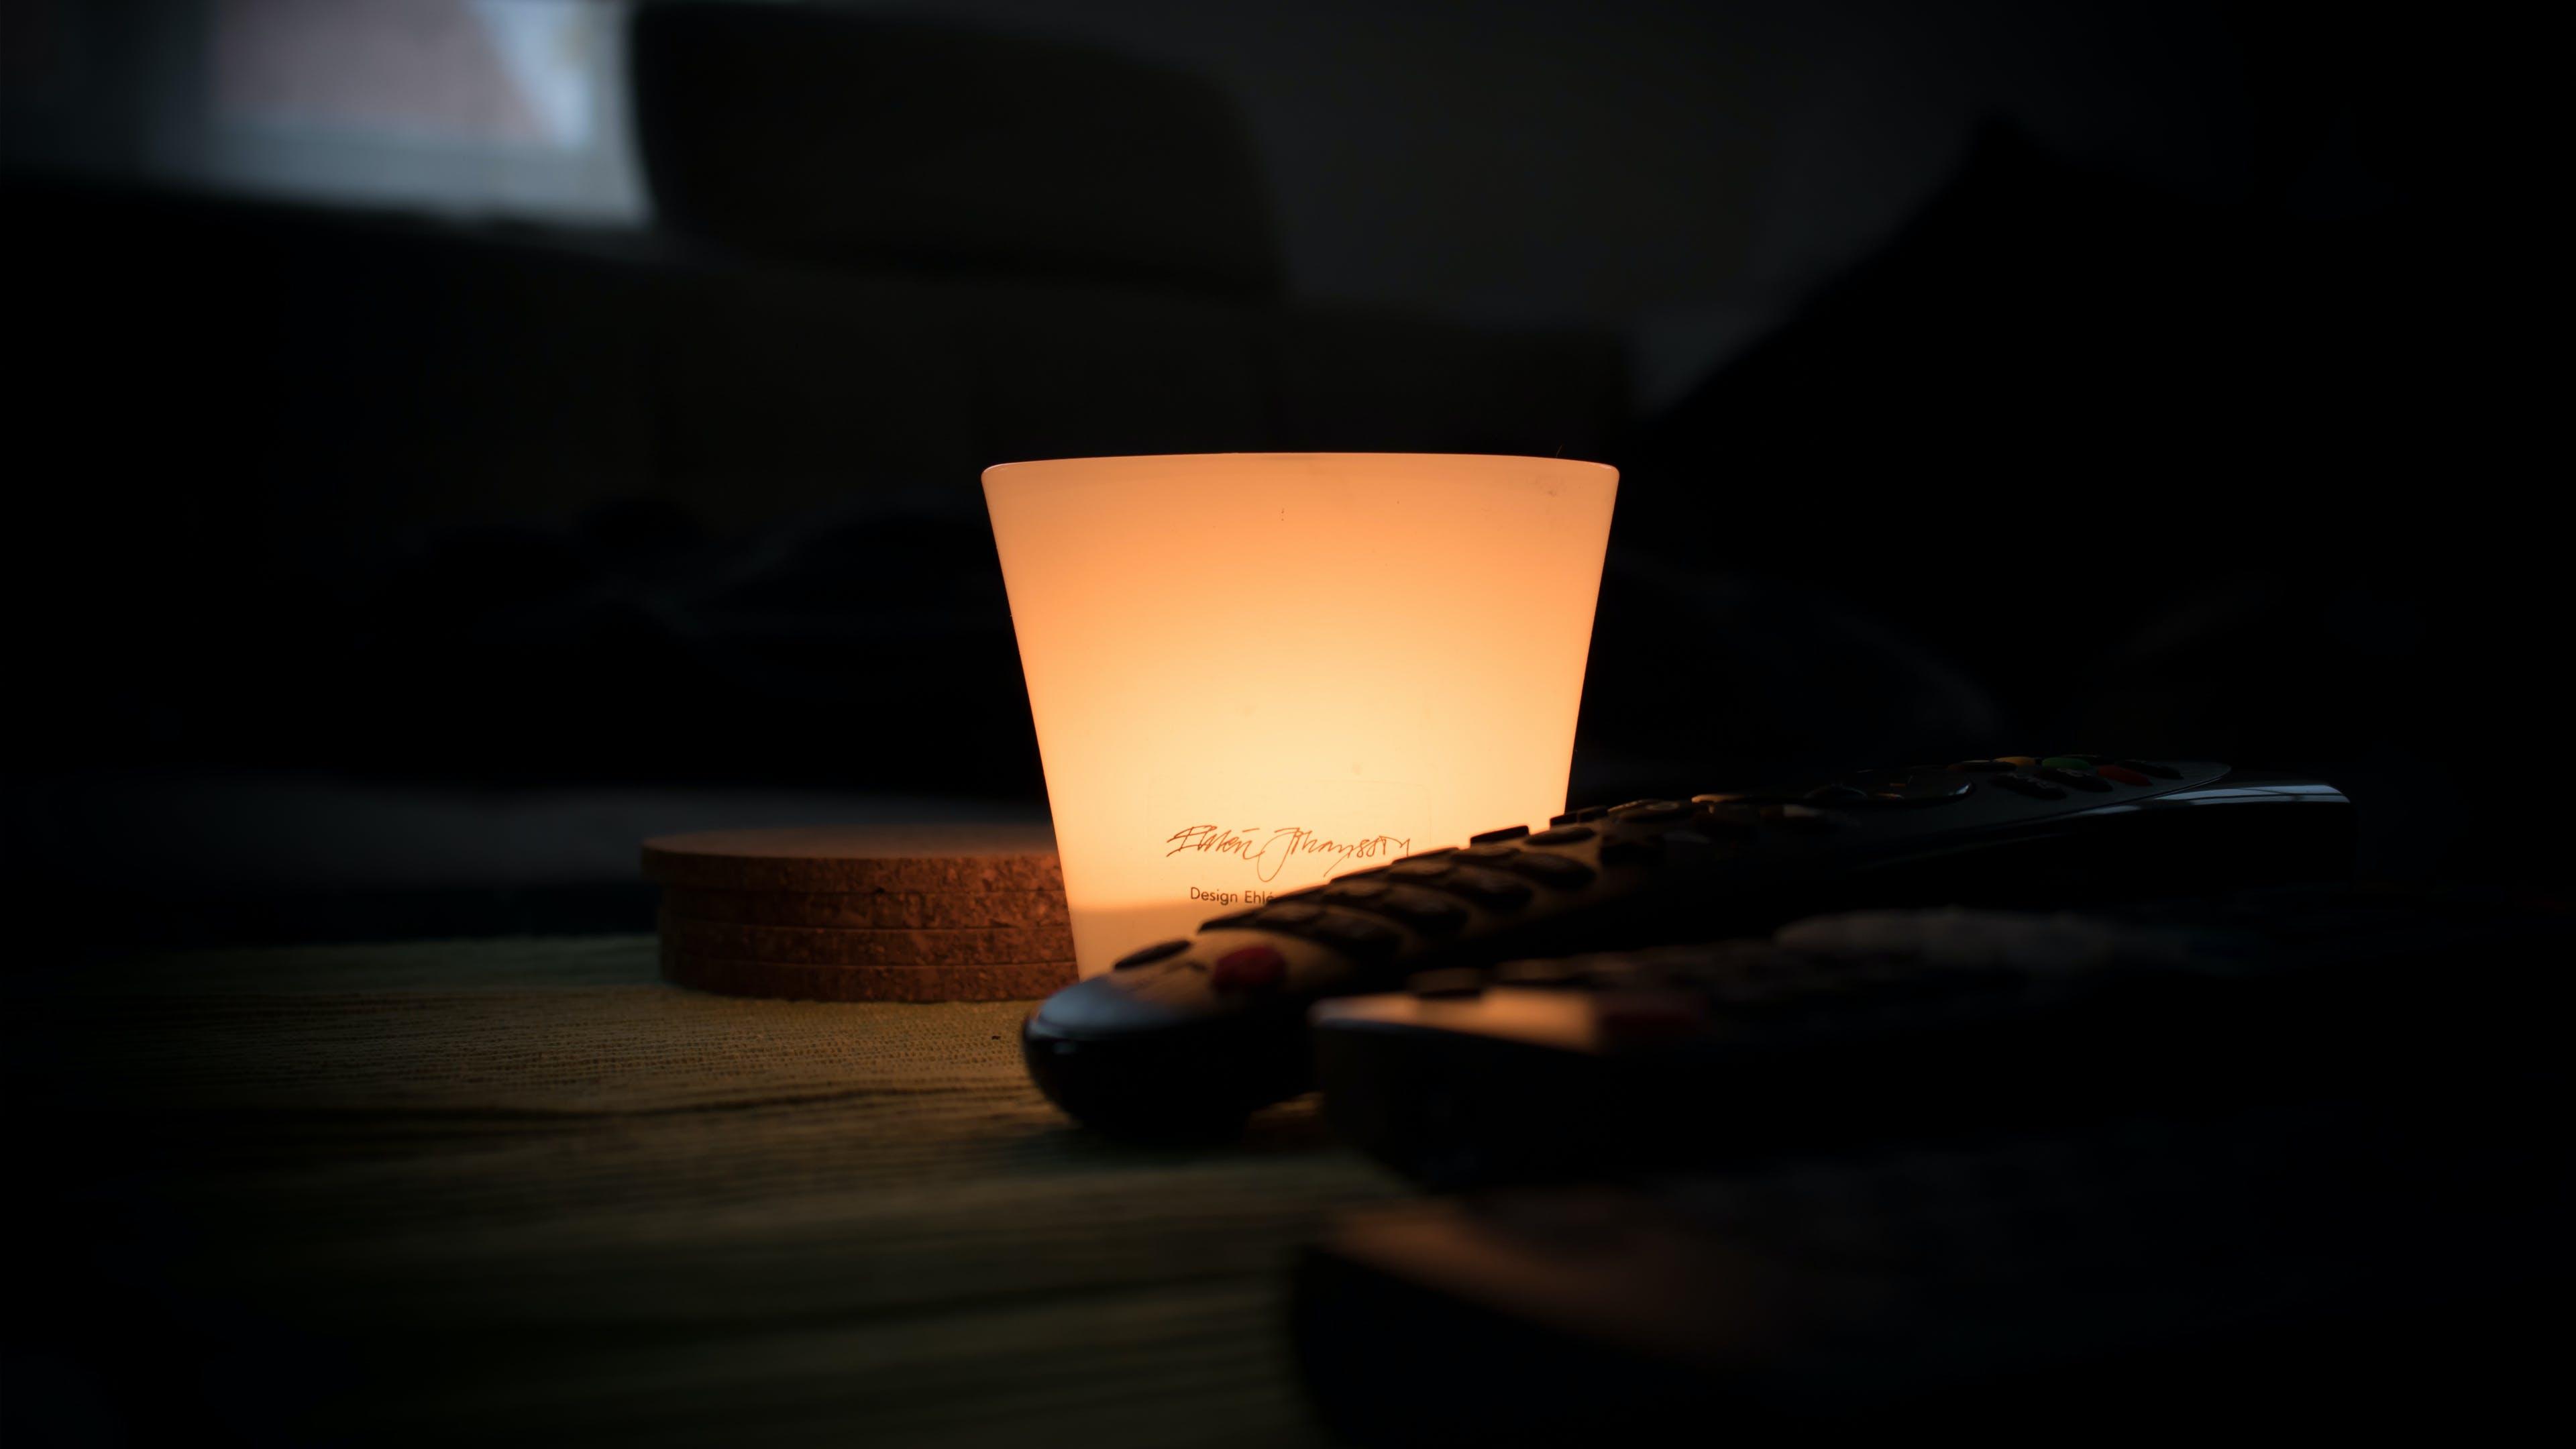 Black Remote Control Near Lamp Inside Dark Room